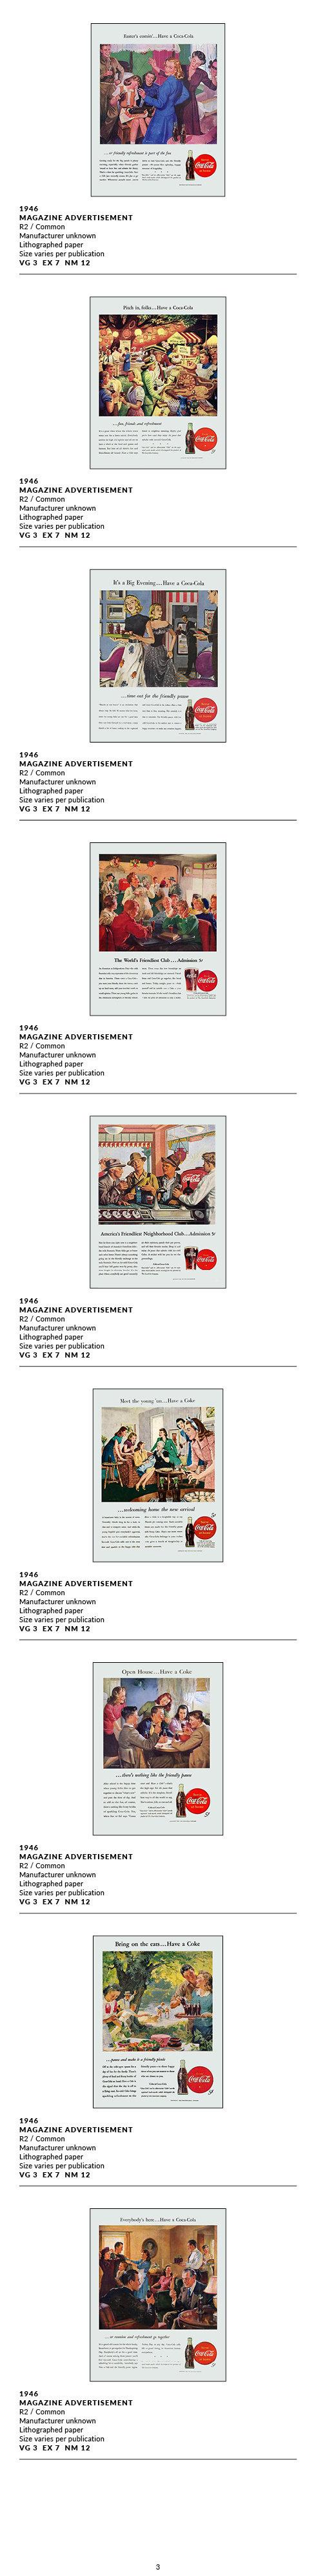 Desktop 1940-49 Ads_3.jpg